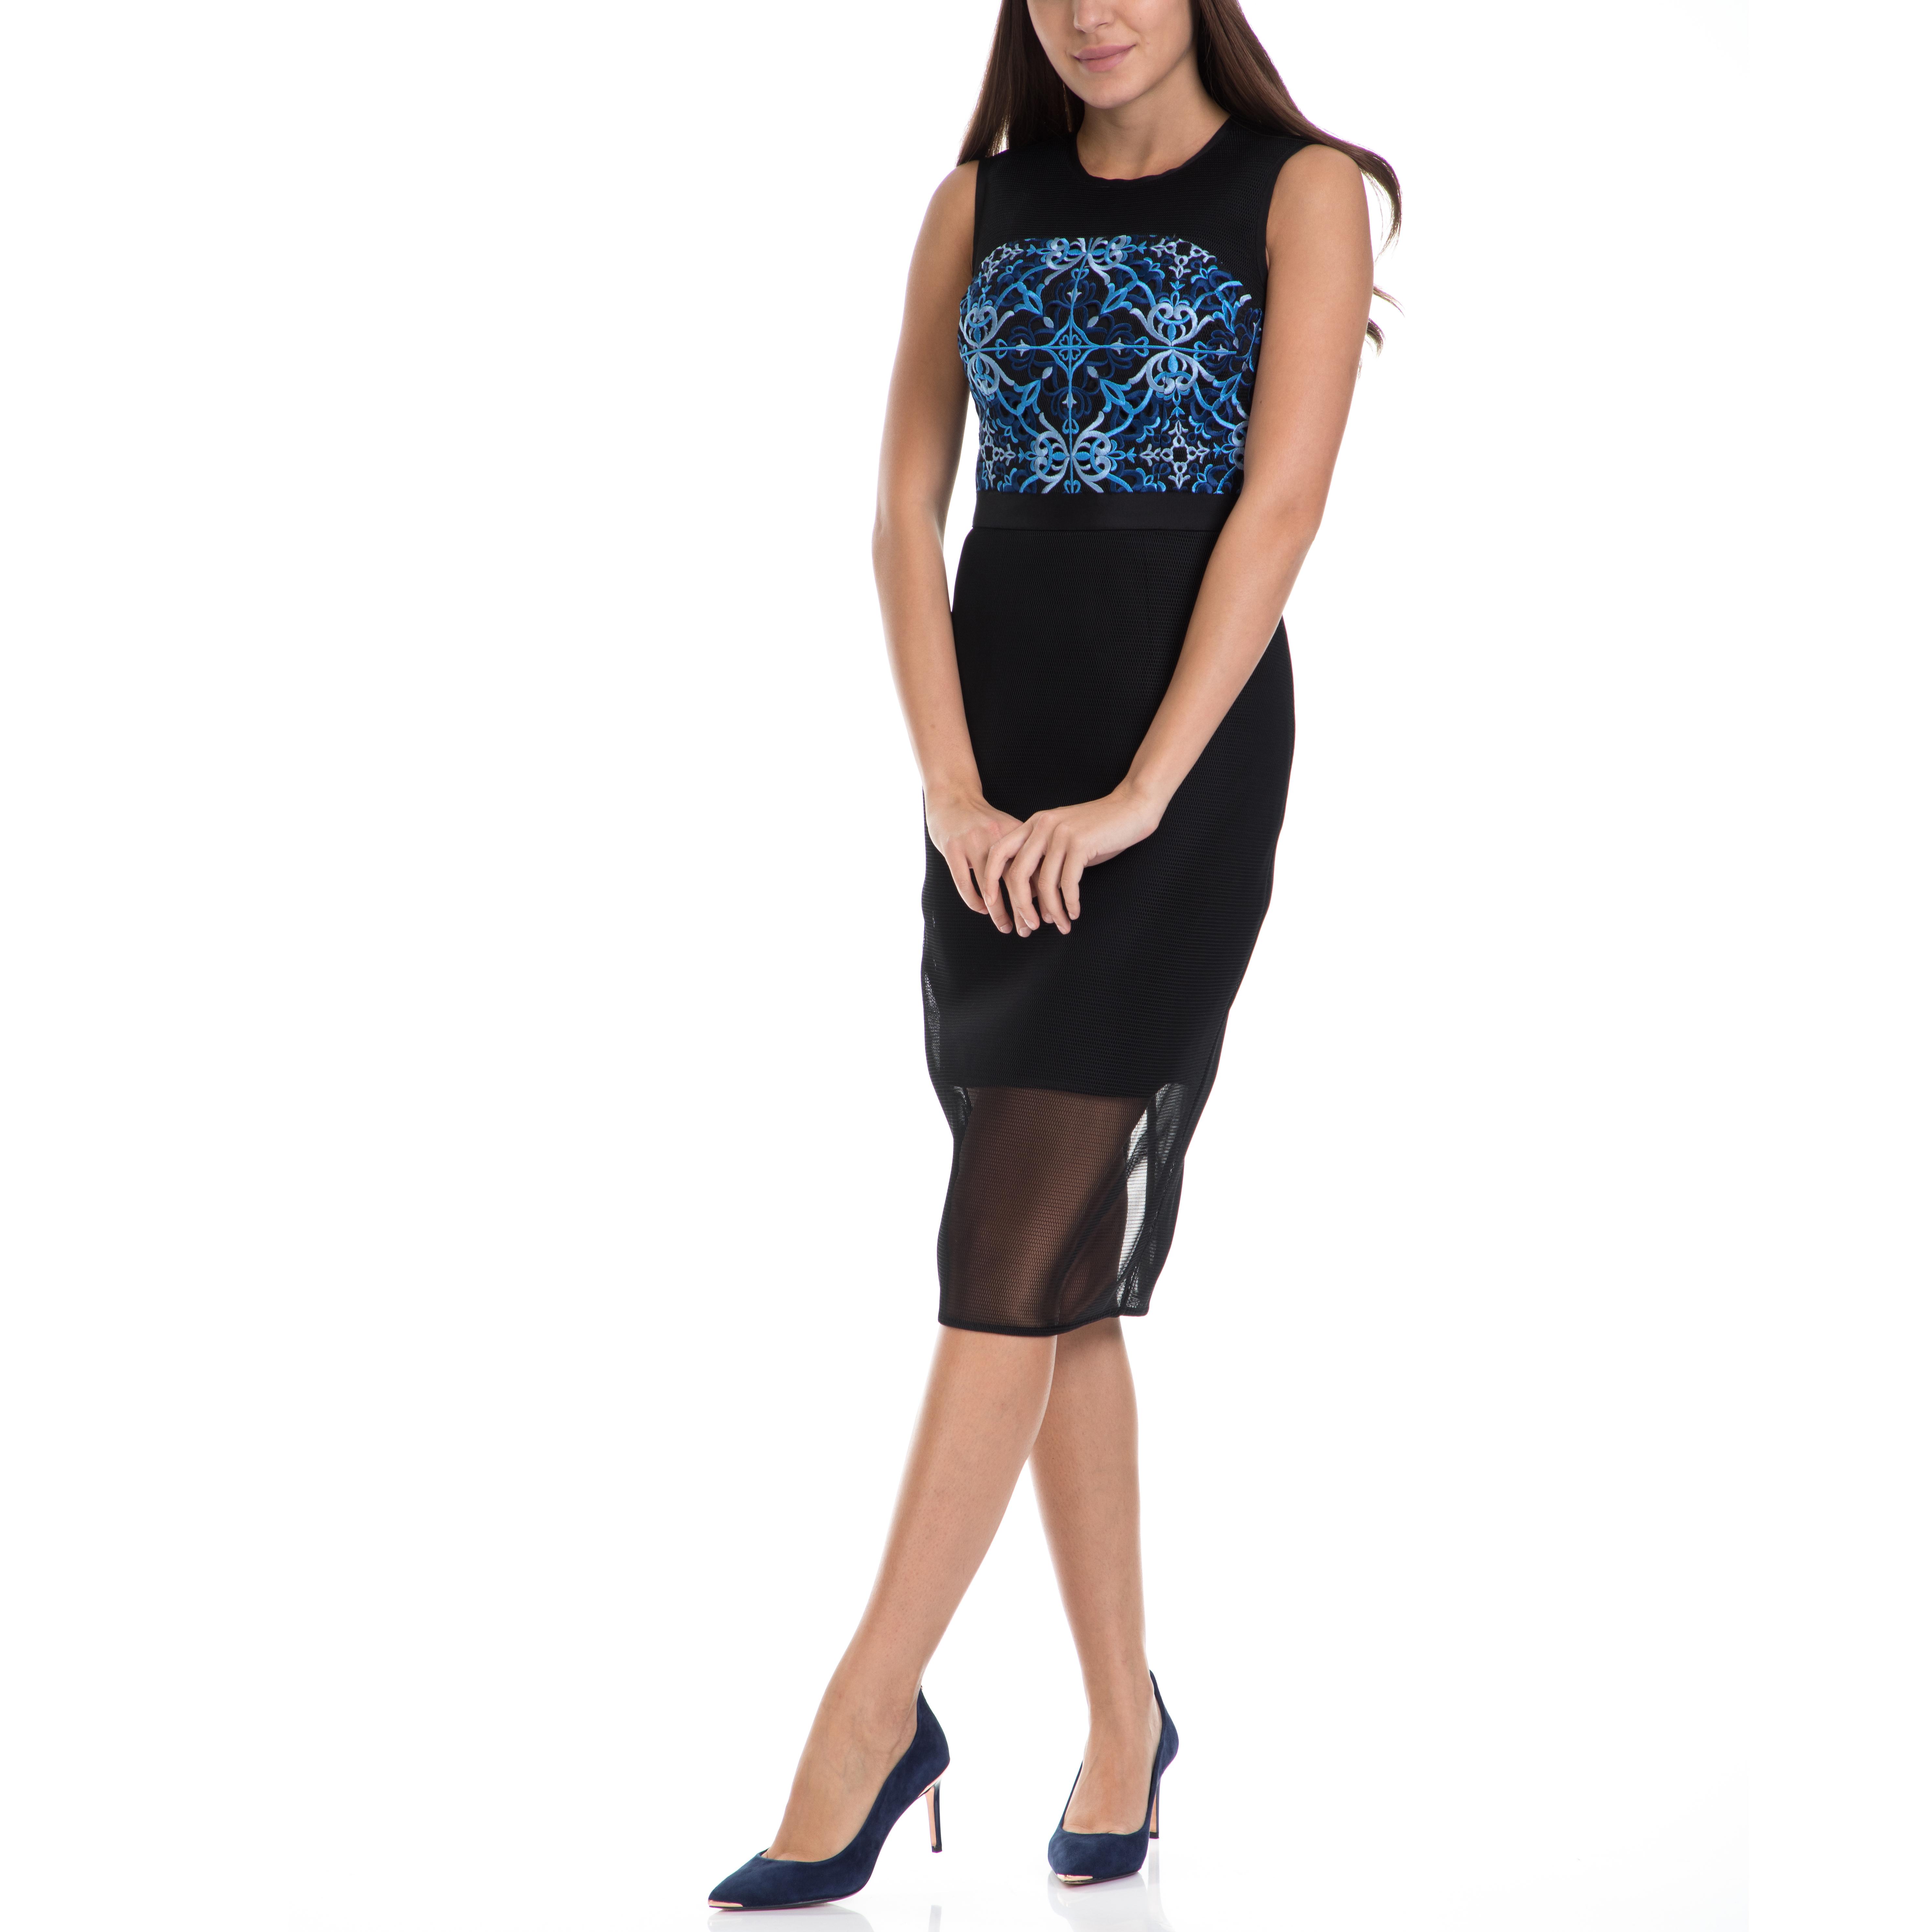 TED BAKER - Γυναικείο μίνι φόρεμα KHYA TED BAKER μαύρο-μπλε γυναικεία ρούχα φορέματα μίνι